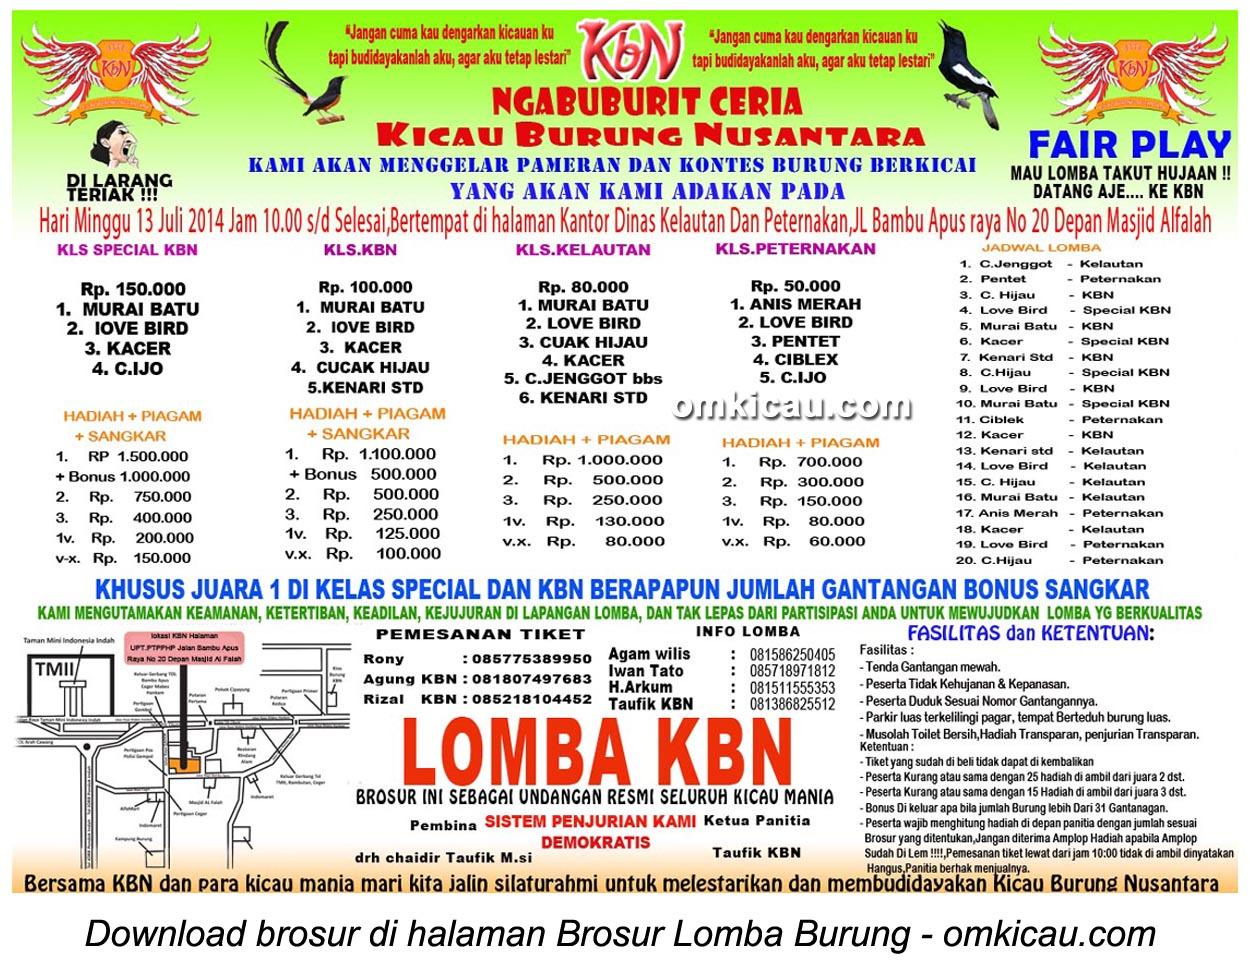 Brosur Lomba Burung Berkicau Ngabuburit Ceria KBN, Jakarta Timur, 13 Juli 2014